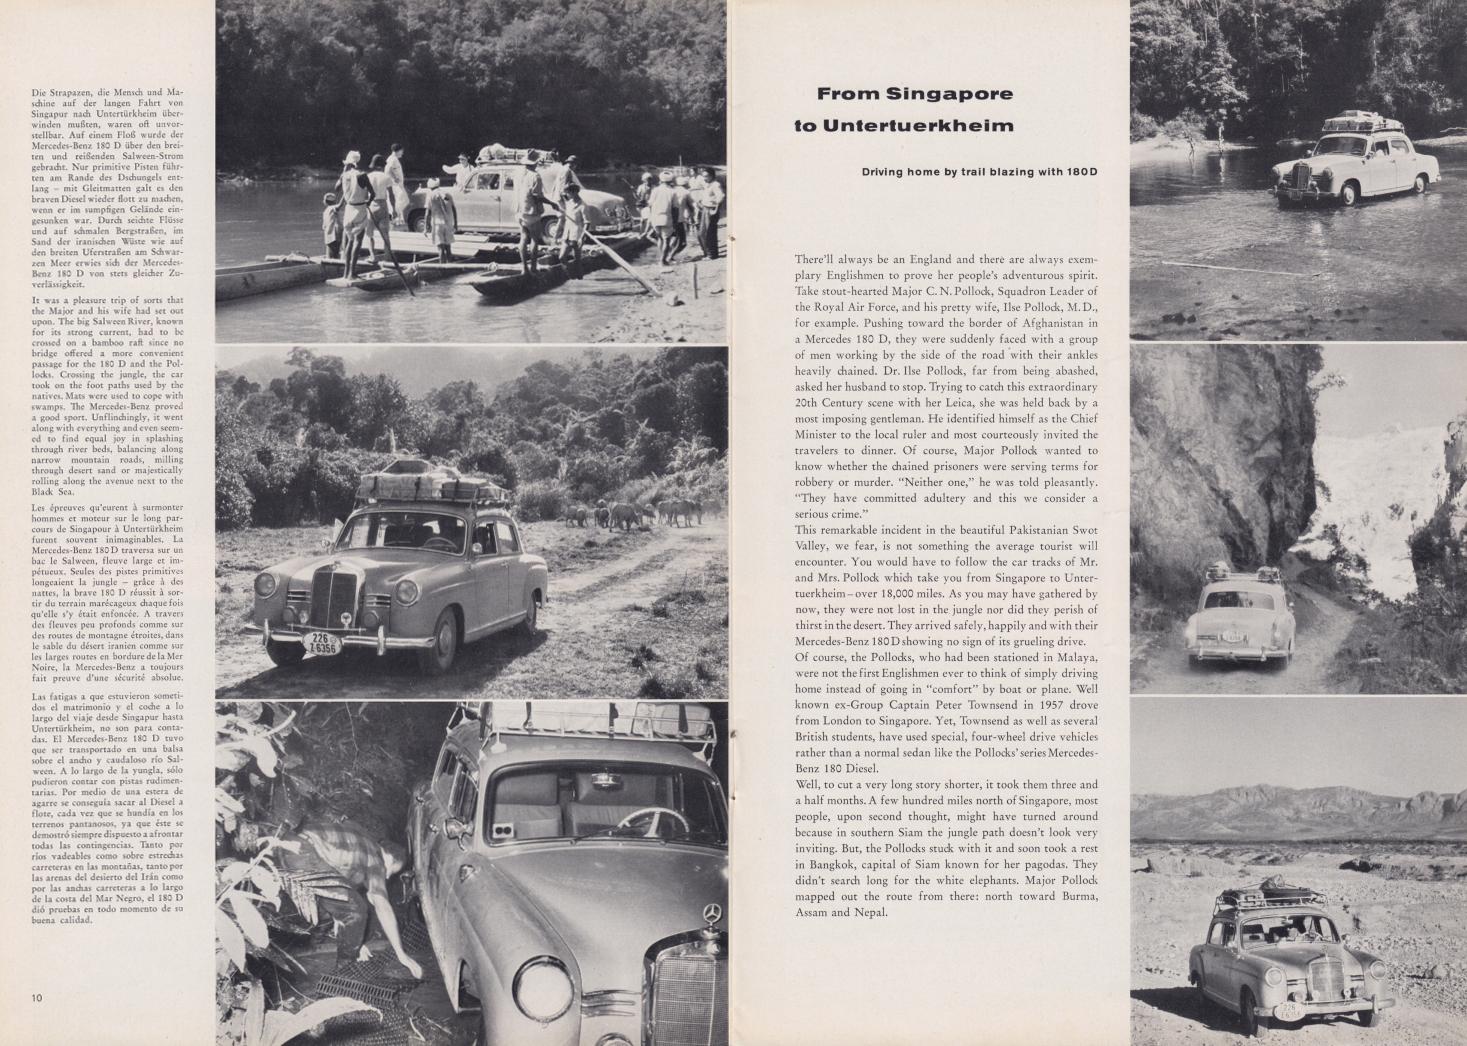 (REVISTA): Periódico In aller welt n.º 32 - Mercedes-Benz no mundo - 1959 - multilingue 006